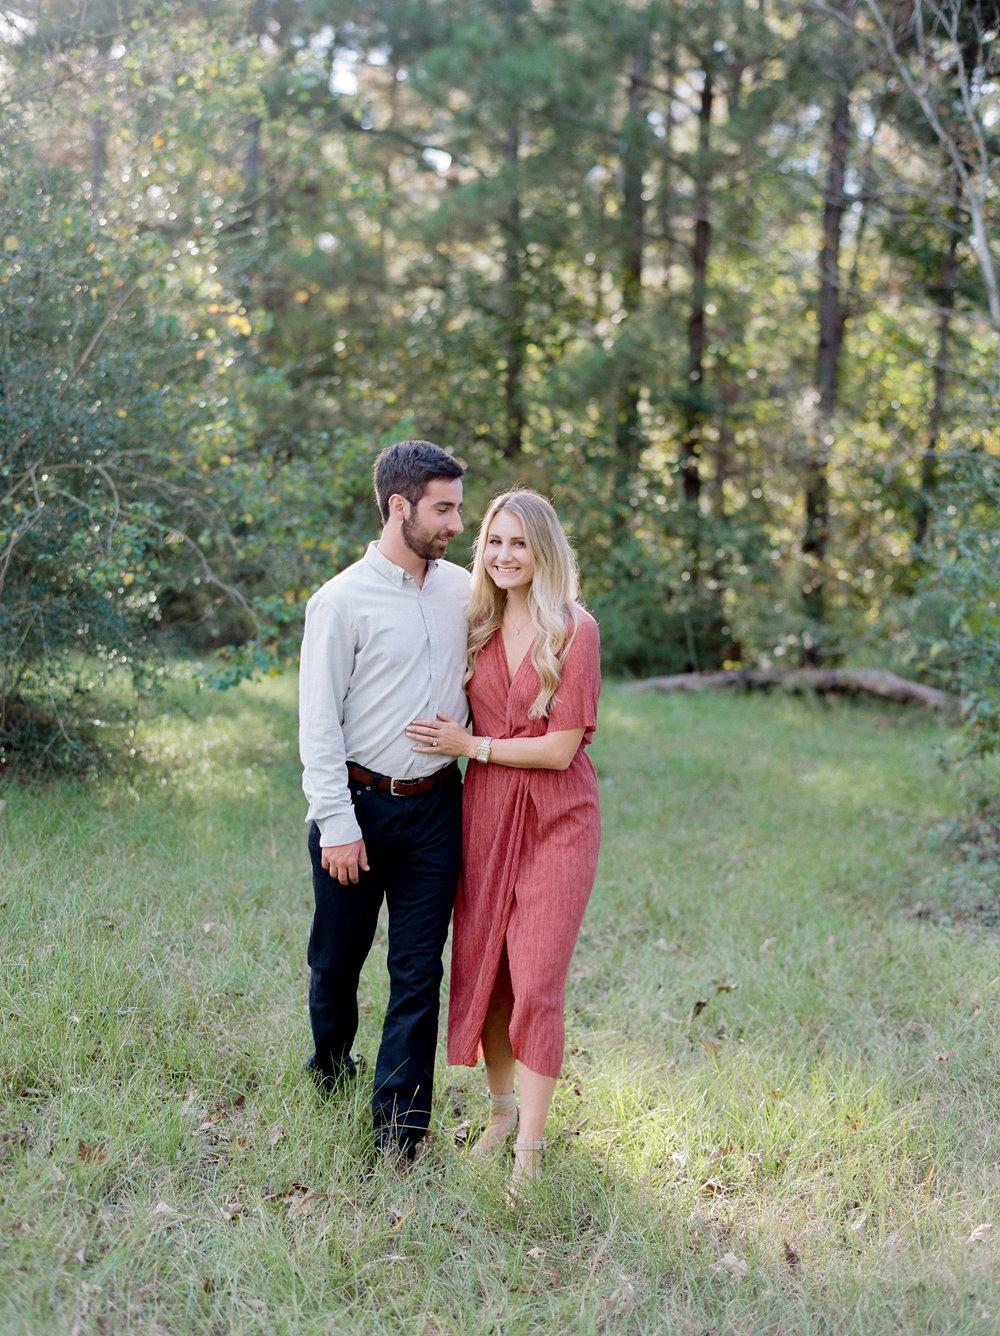 Houston-Fine-Art-Film-Destination-Wedding-Photographer-Top-Best-Luxury-Josh-Dana-Fernandez-Photographer-Austin-Texas-28.jpg